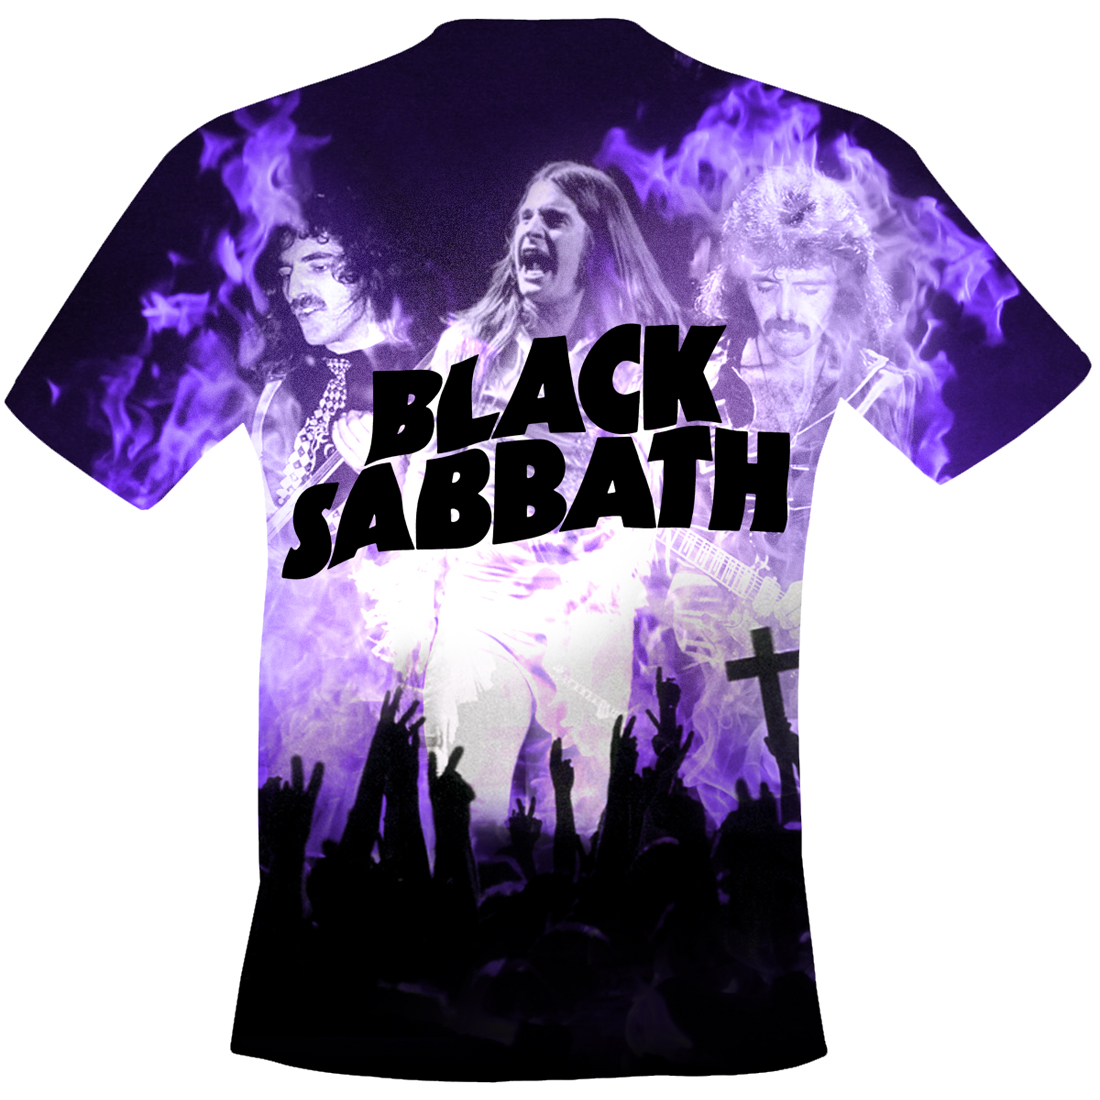 Black Sabbath Ozzy Osbourne Tony Iommi Geezer Butler Official Black Sabbath Website.